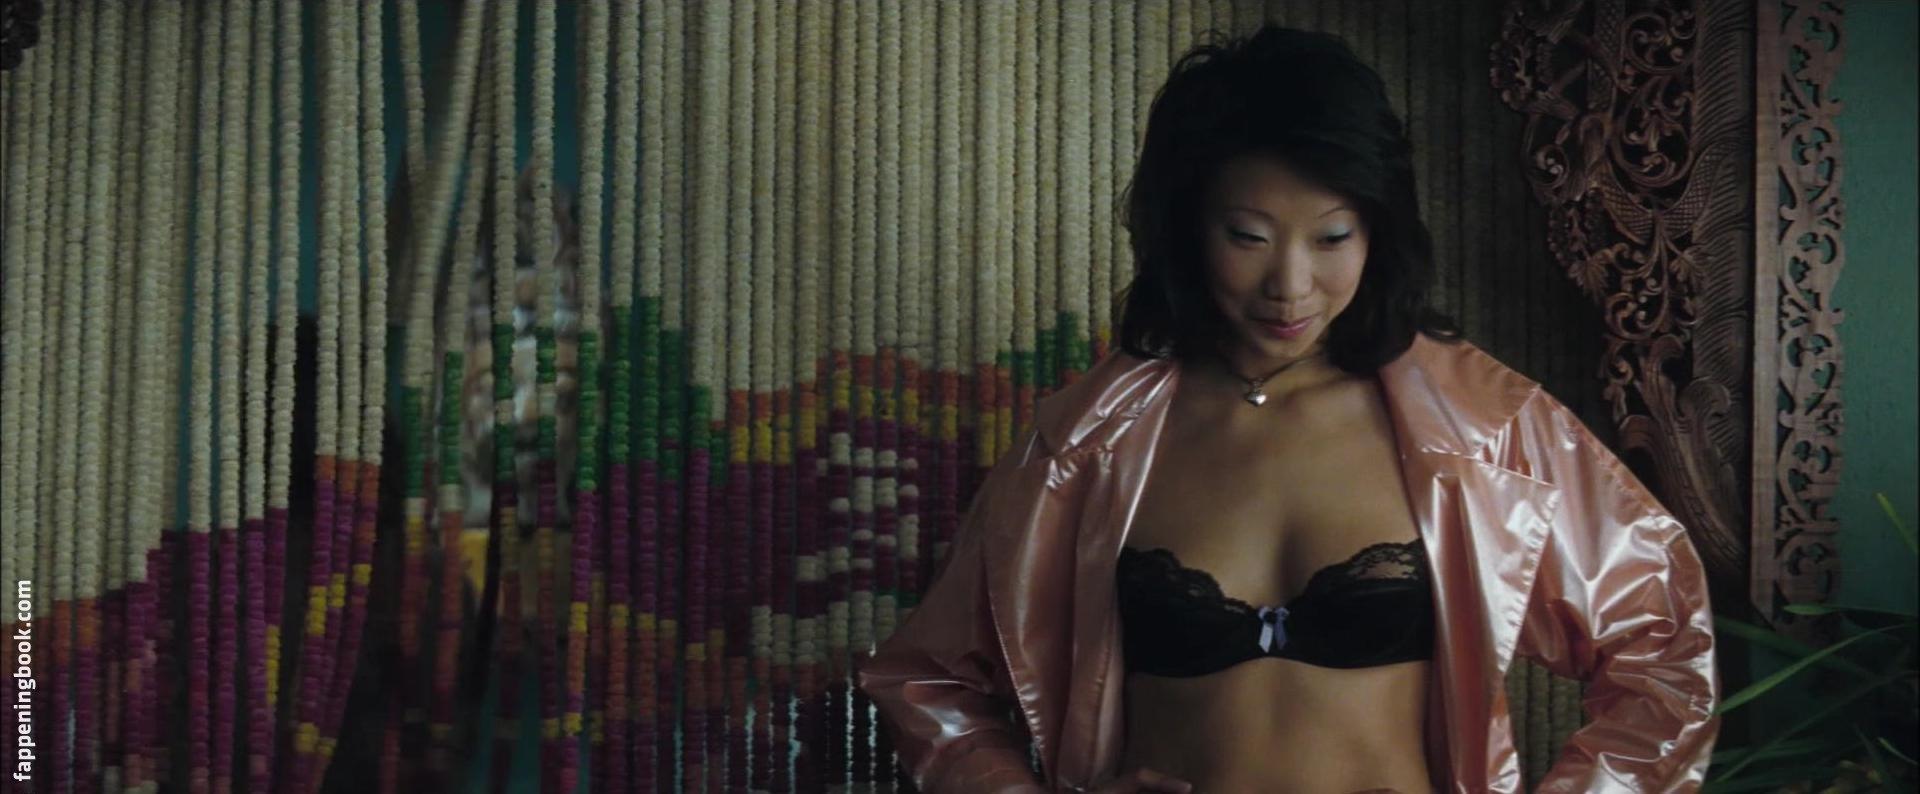 Ting-Ting Hu Nude